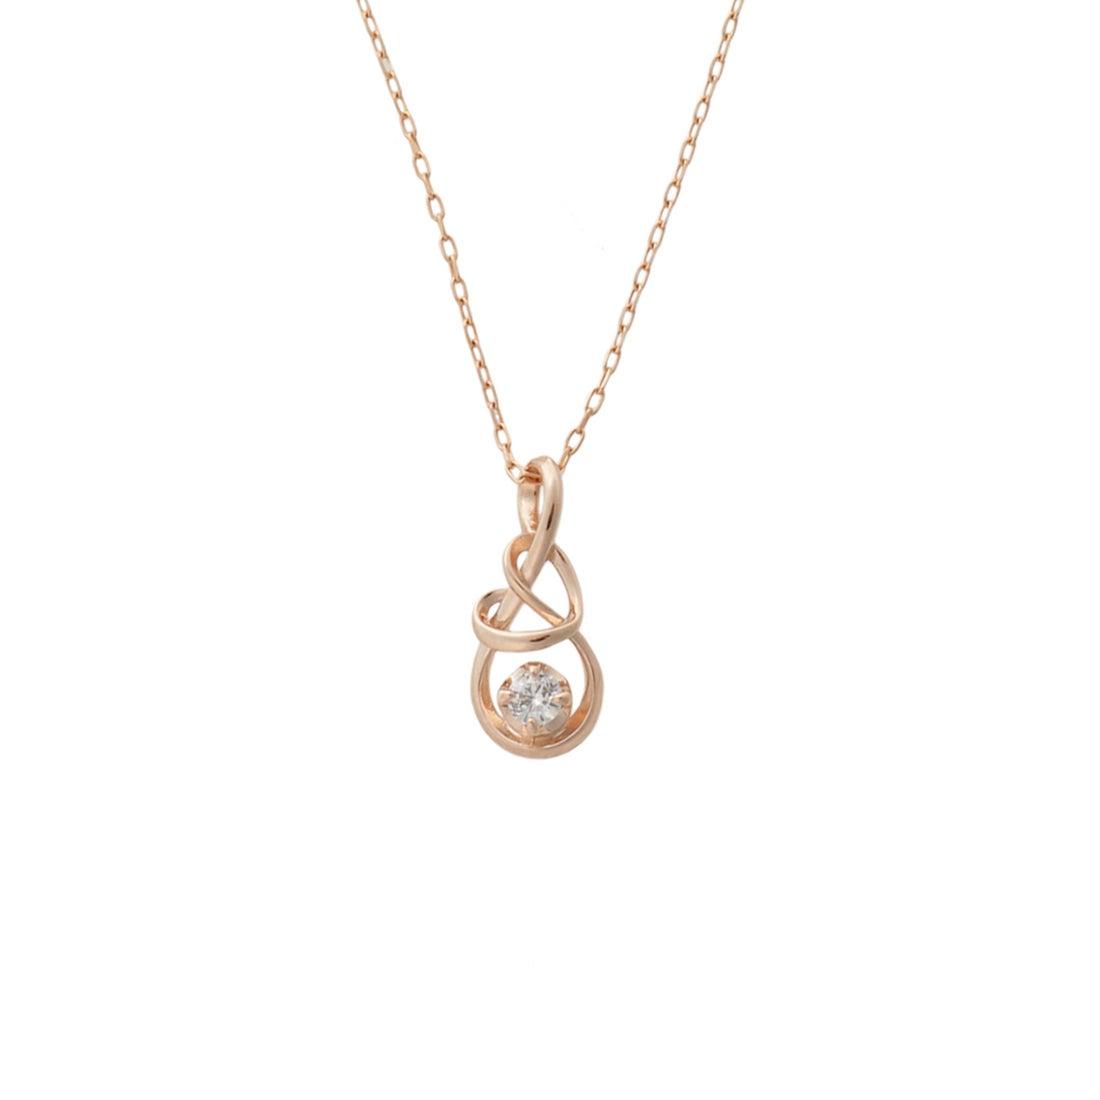 buy popular b79c1 b3a9c Samantha Thavasa サマンサティアラ Infinity Love knot ...